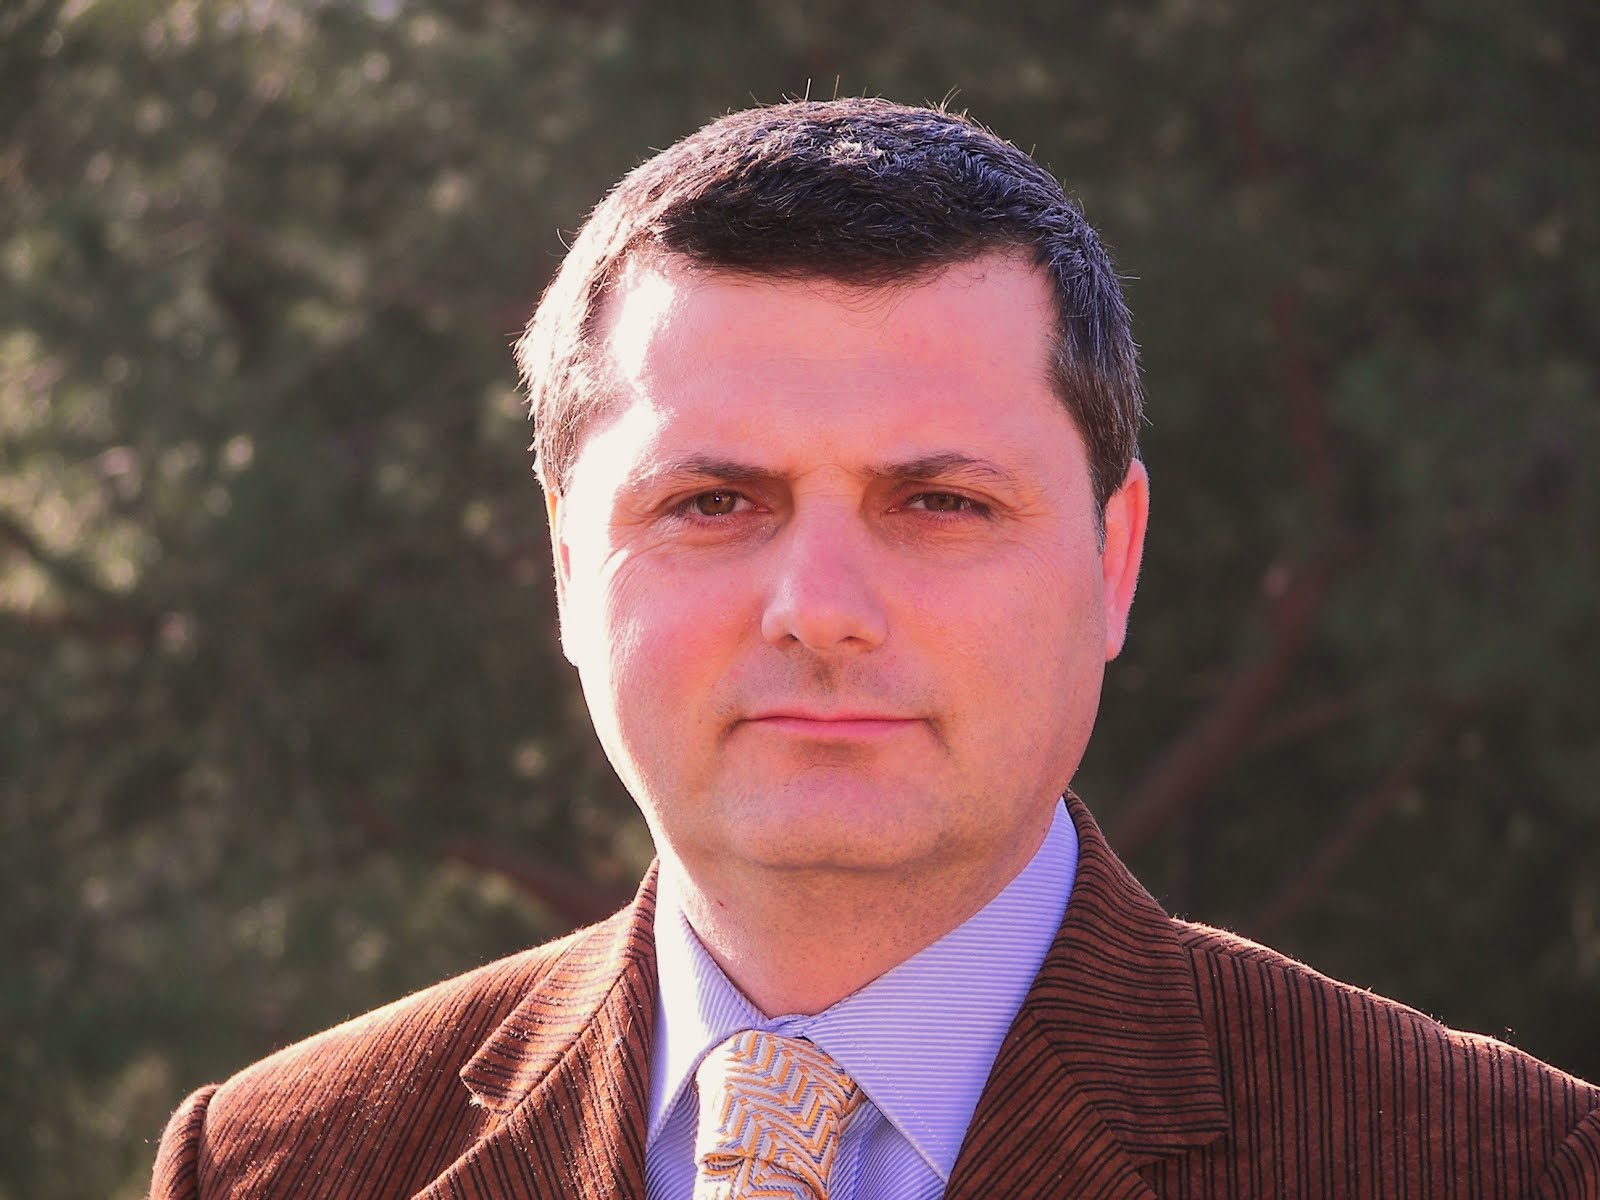 Consulente Vodafone Augusto Caratelli   Mobile 347.7747707  Email: augusto.caratelli@gmail.com